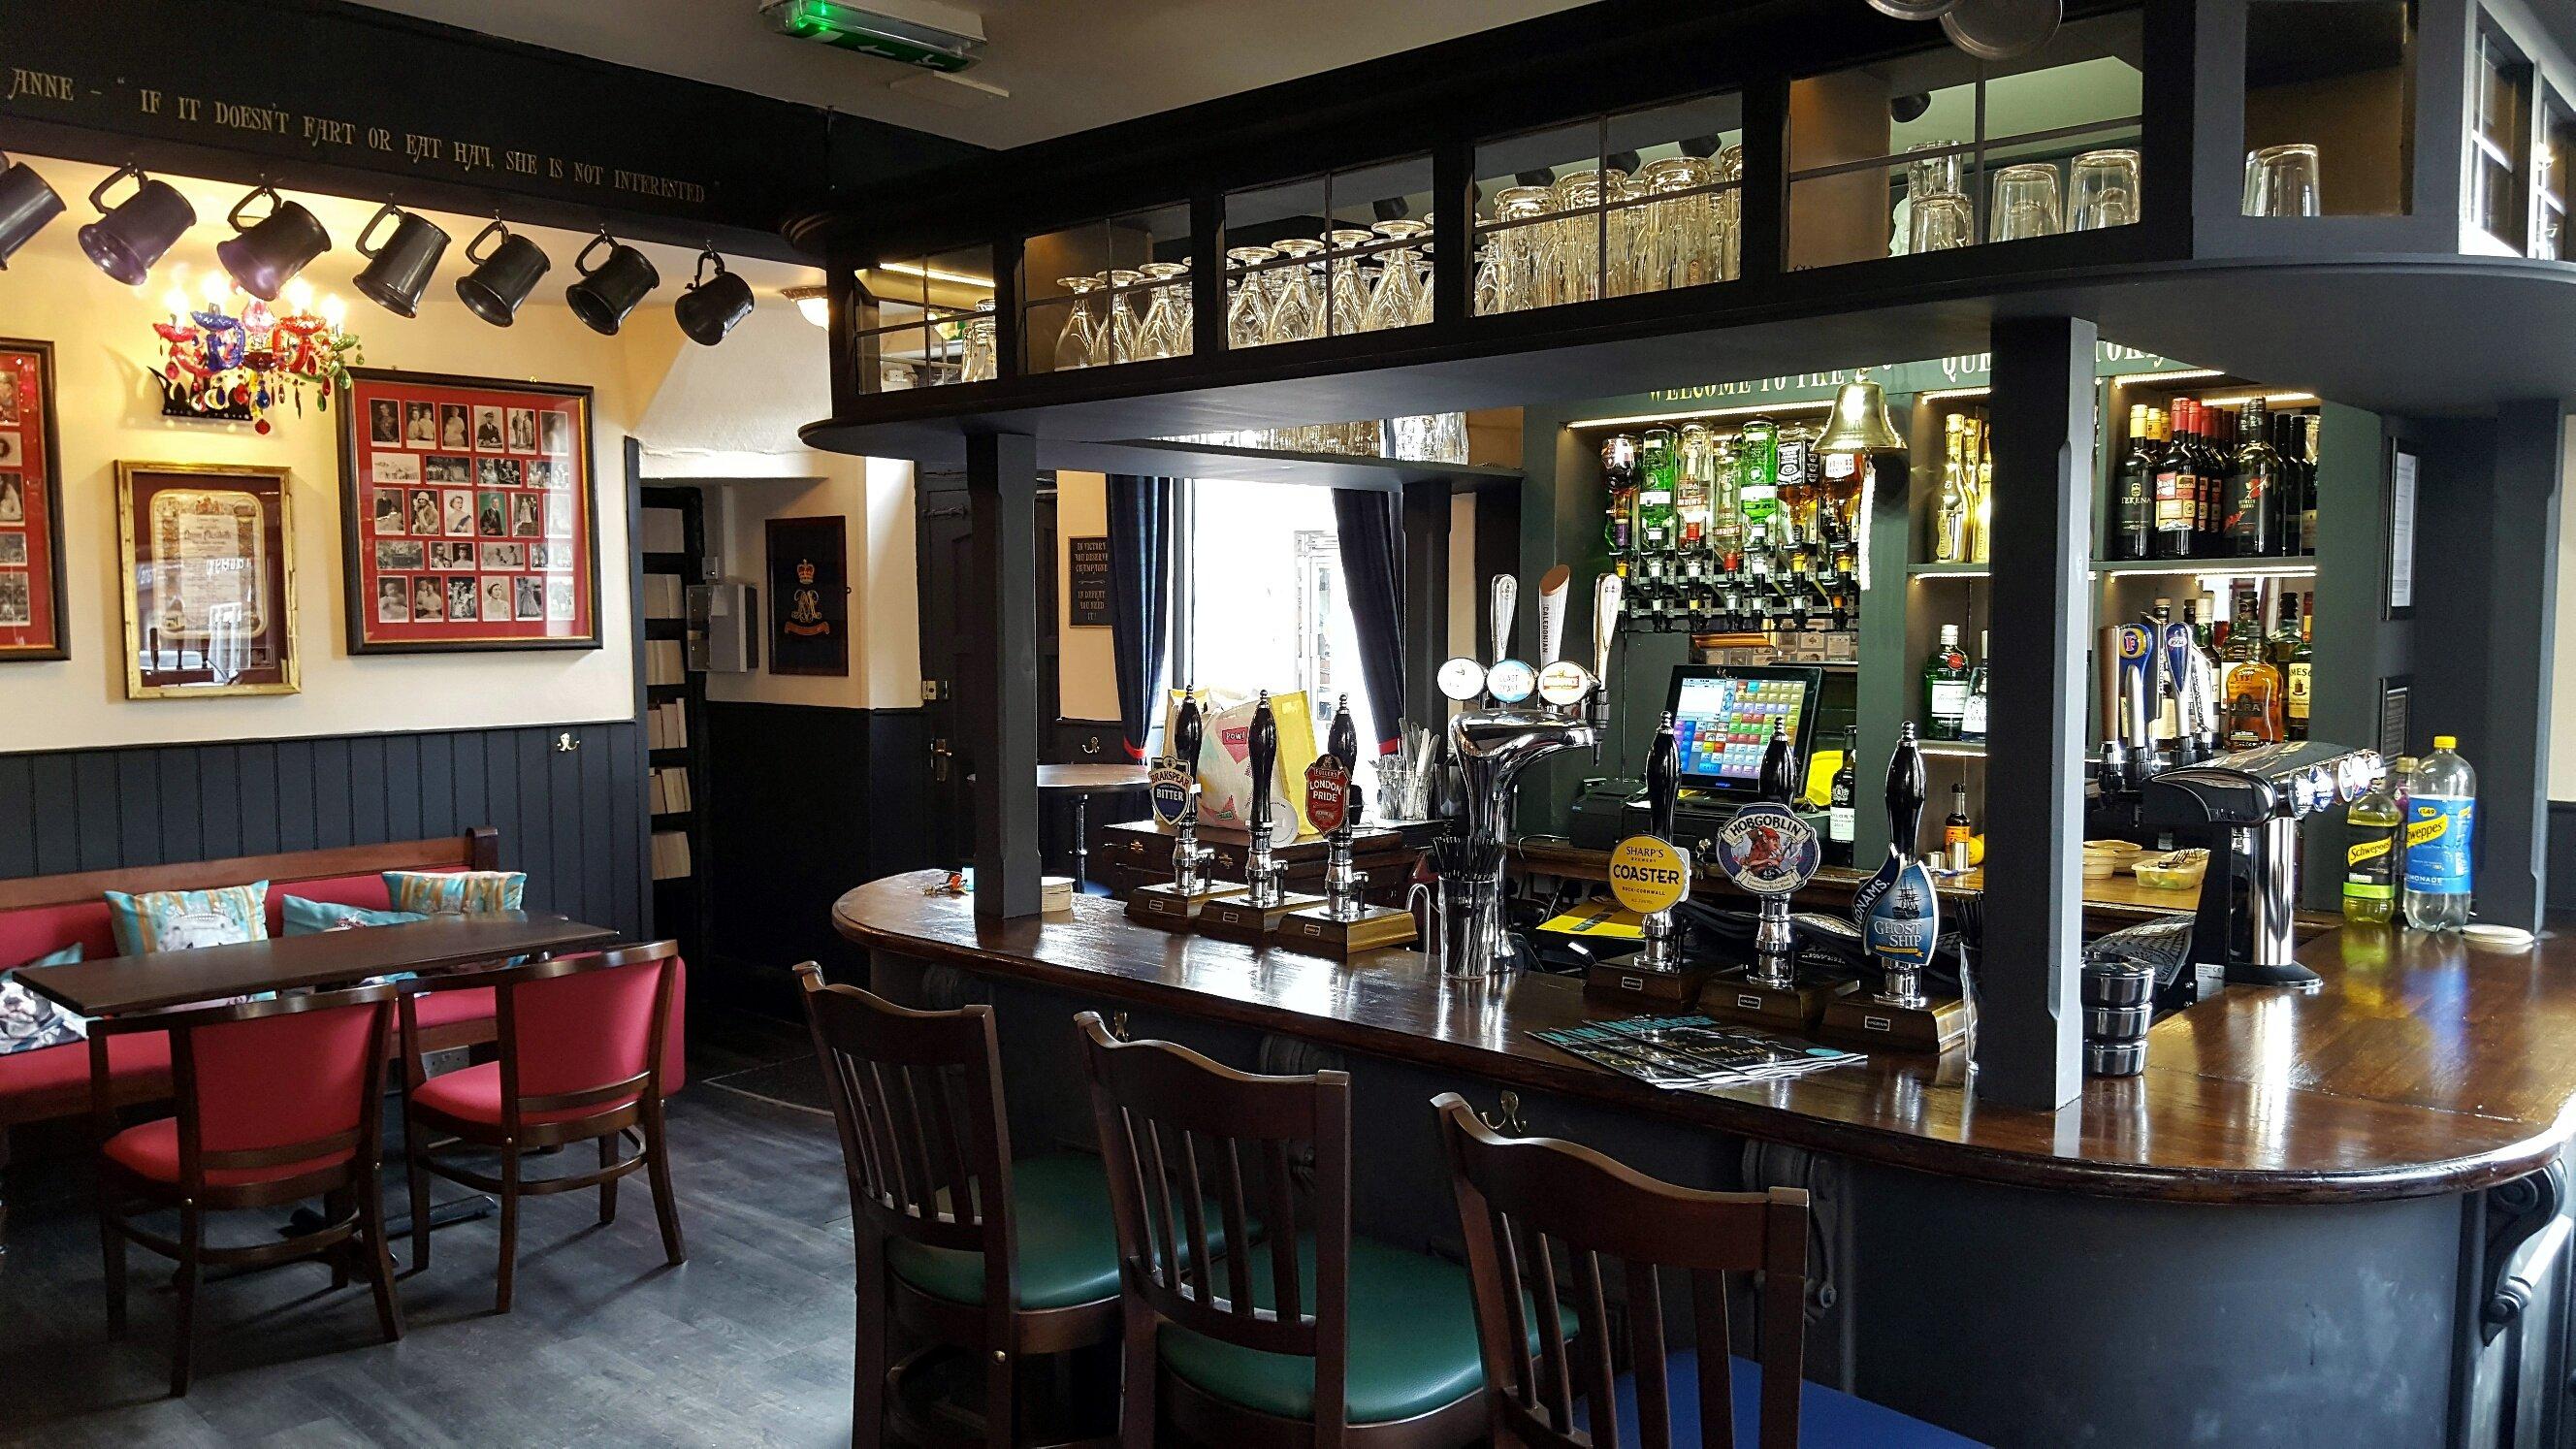 Pub And Kitchen Menu